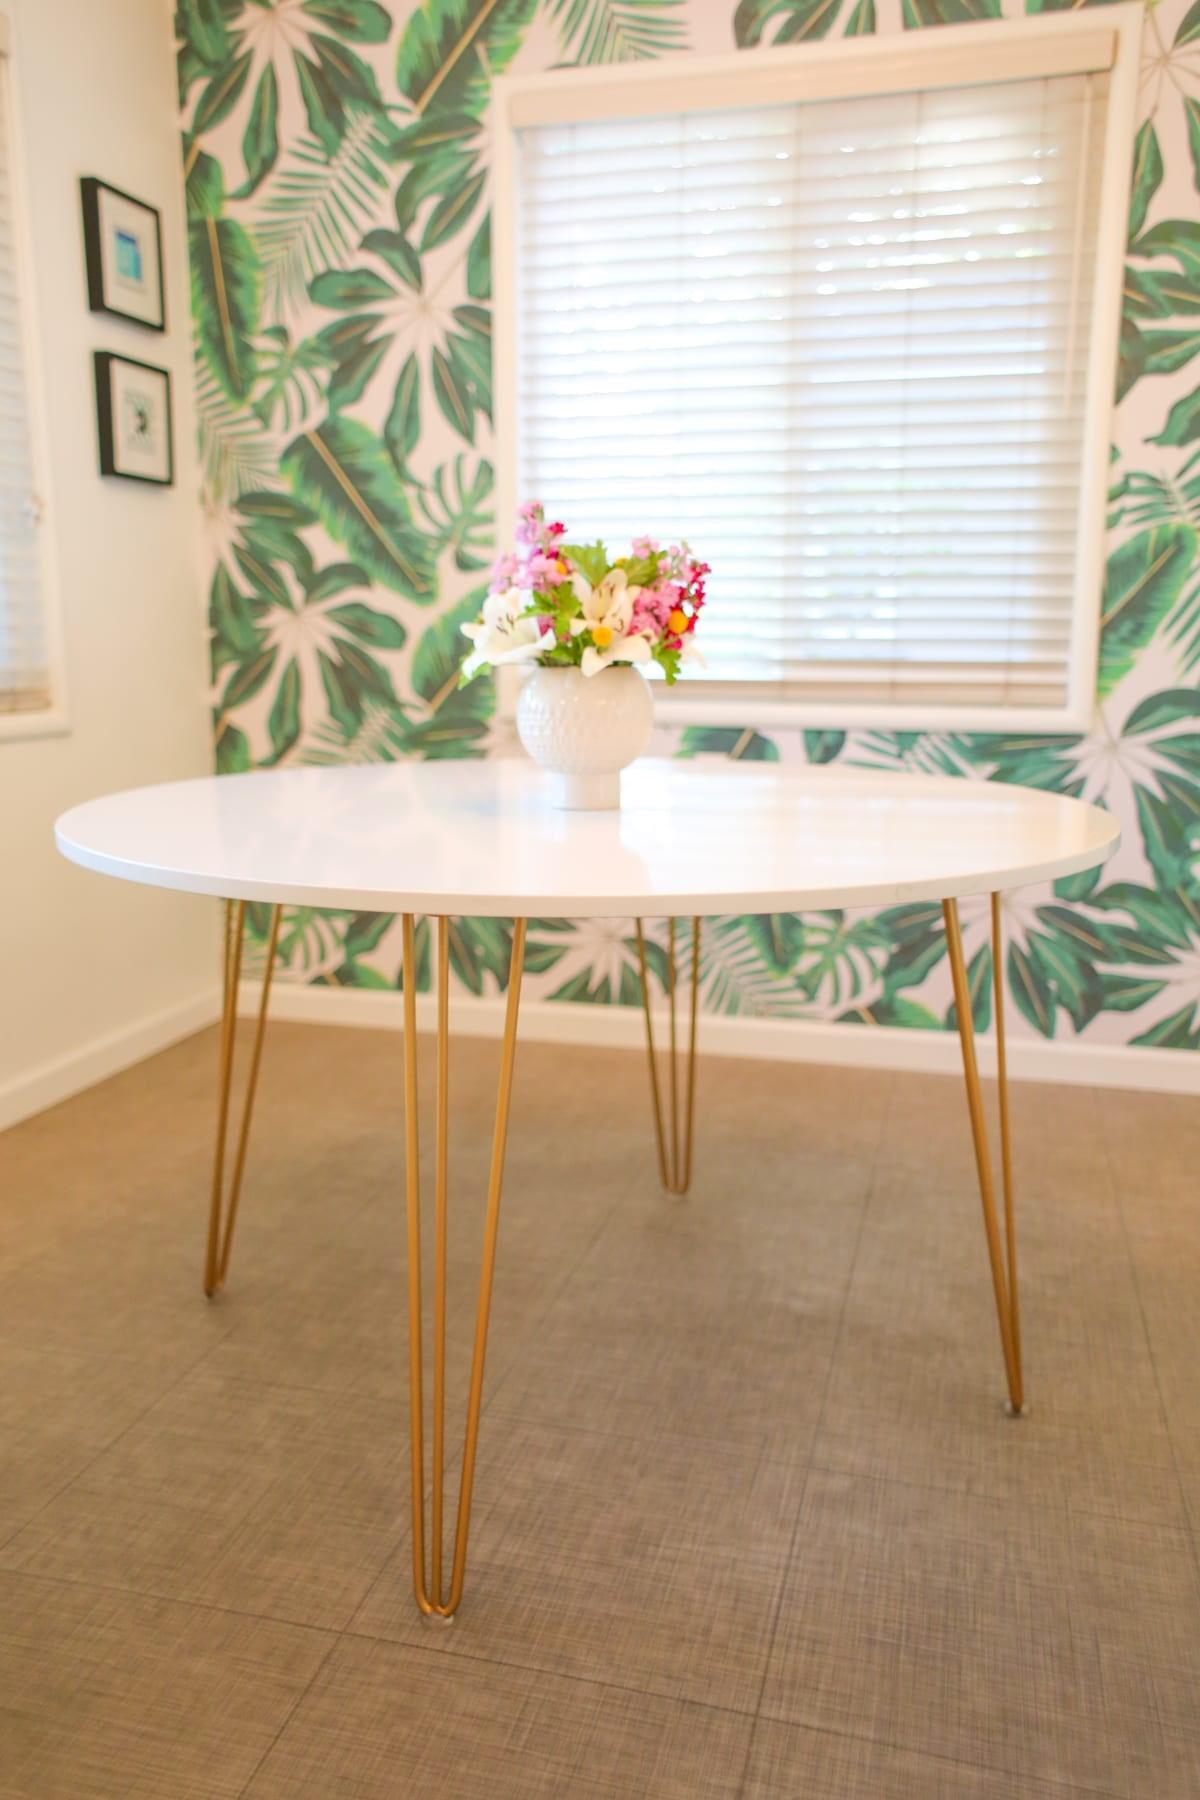 6. Round Mid Century Modern Table via Simphome